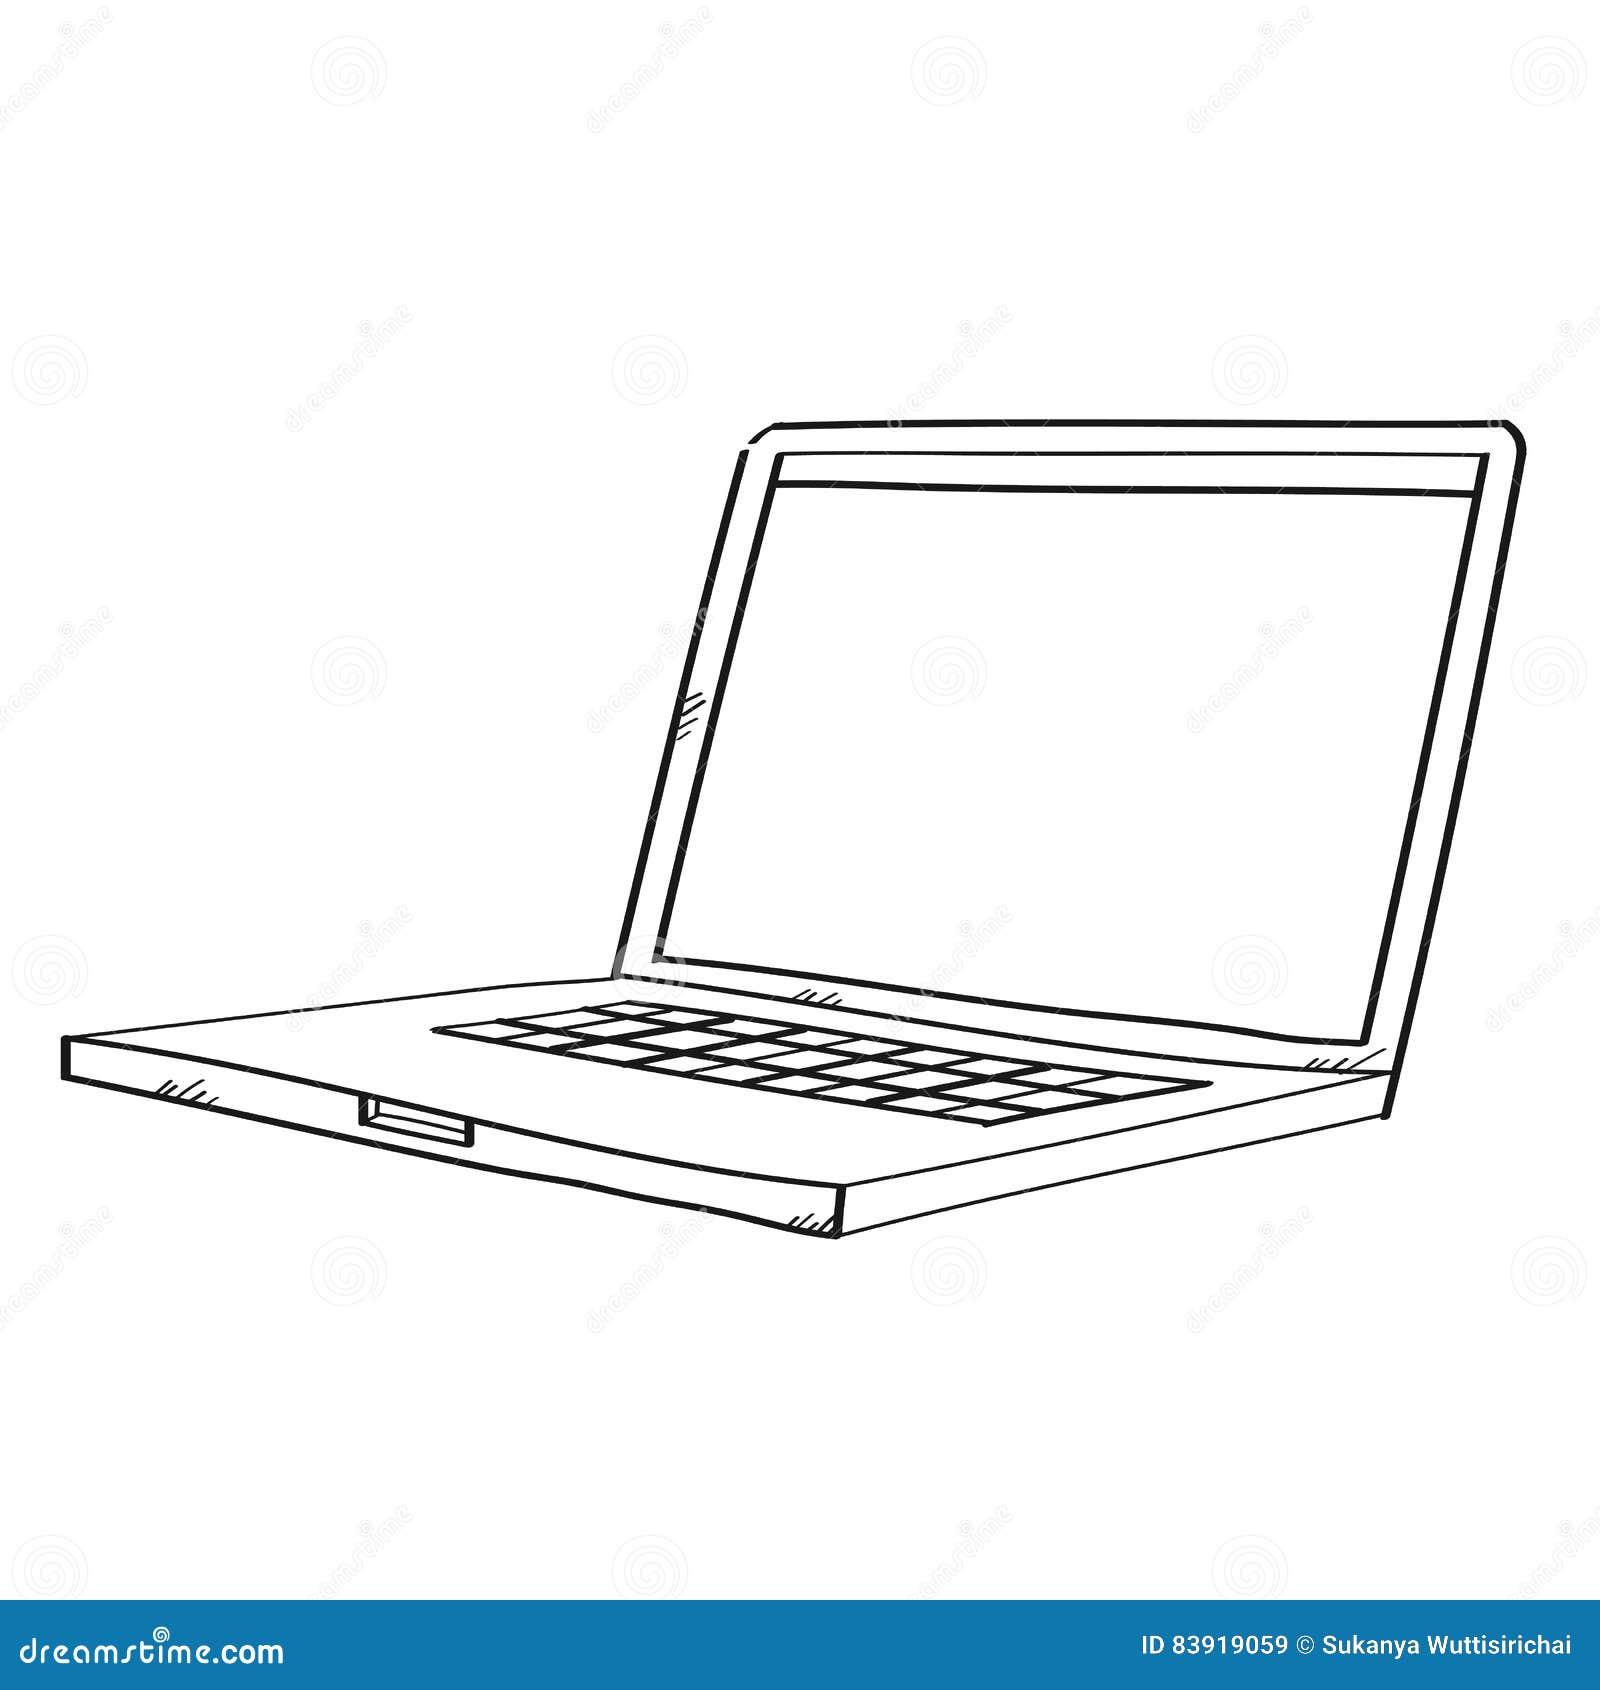 ordinateur portable d 39 illustration de dessin de dessin. Black Bedroom Furniture Sets. Home Design Ideas